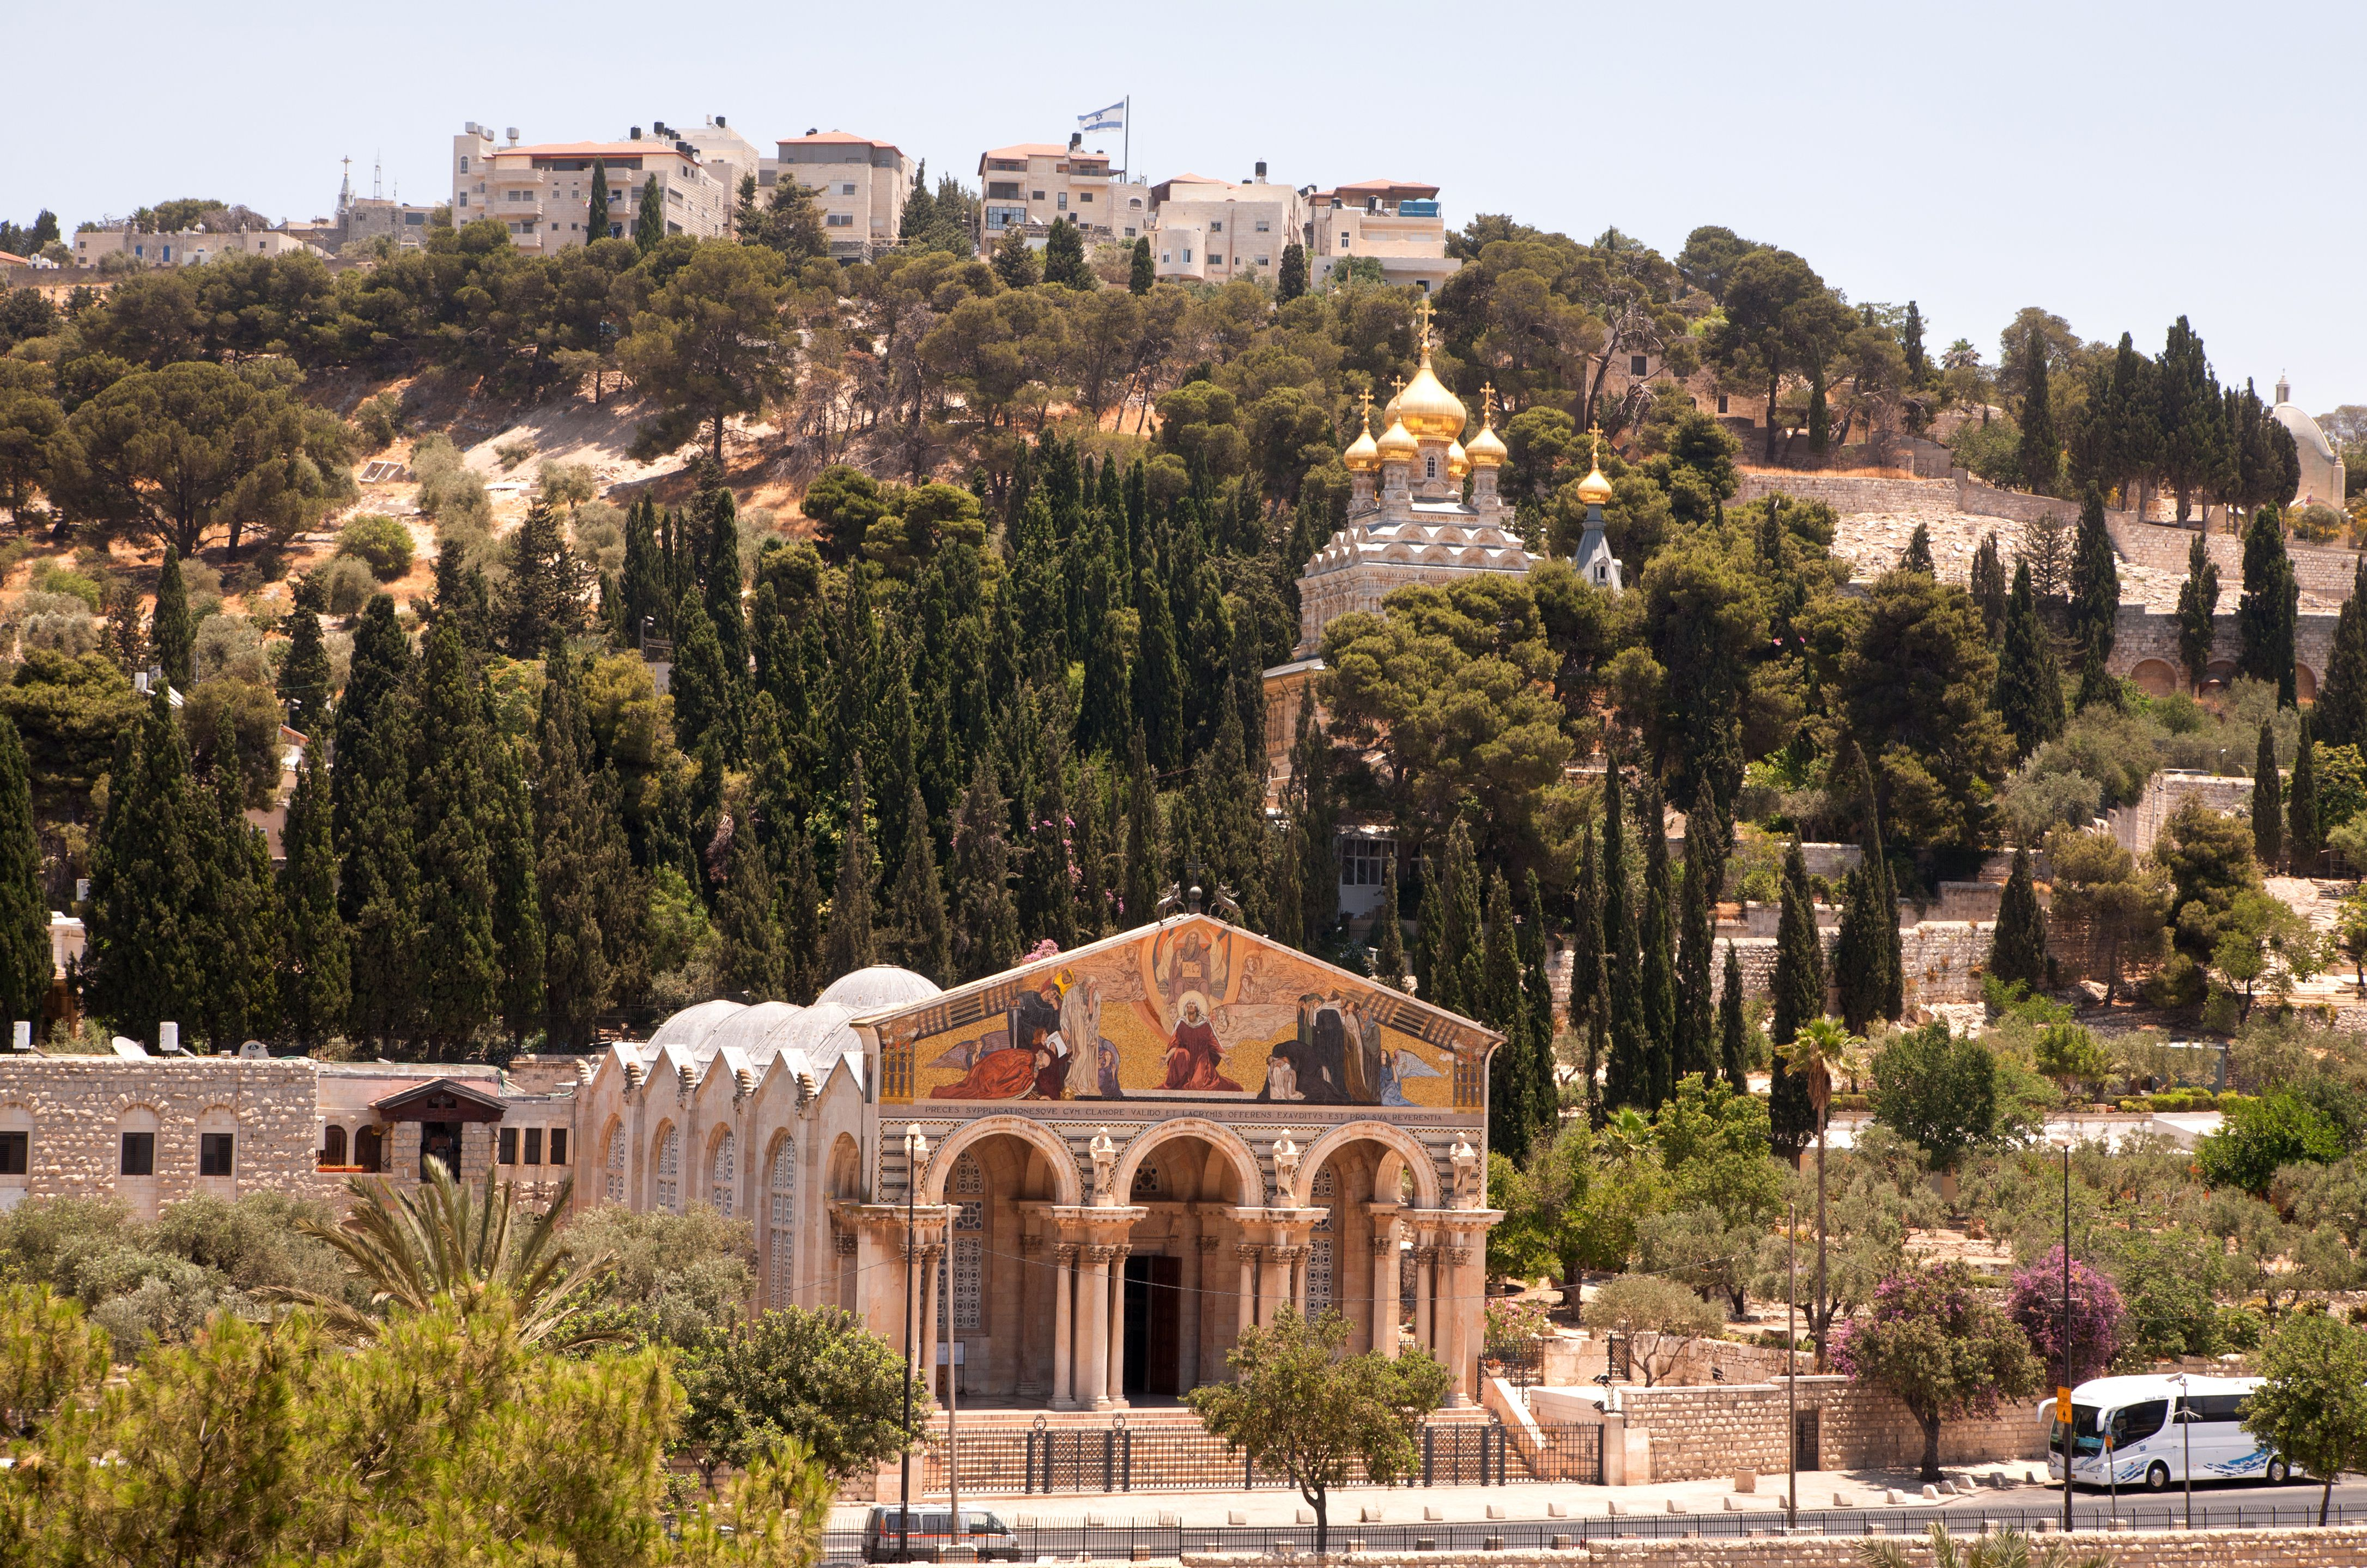 Biserica de pe Muntele Maslinilor, Ierusalim, pelerinaj Israel